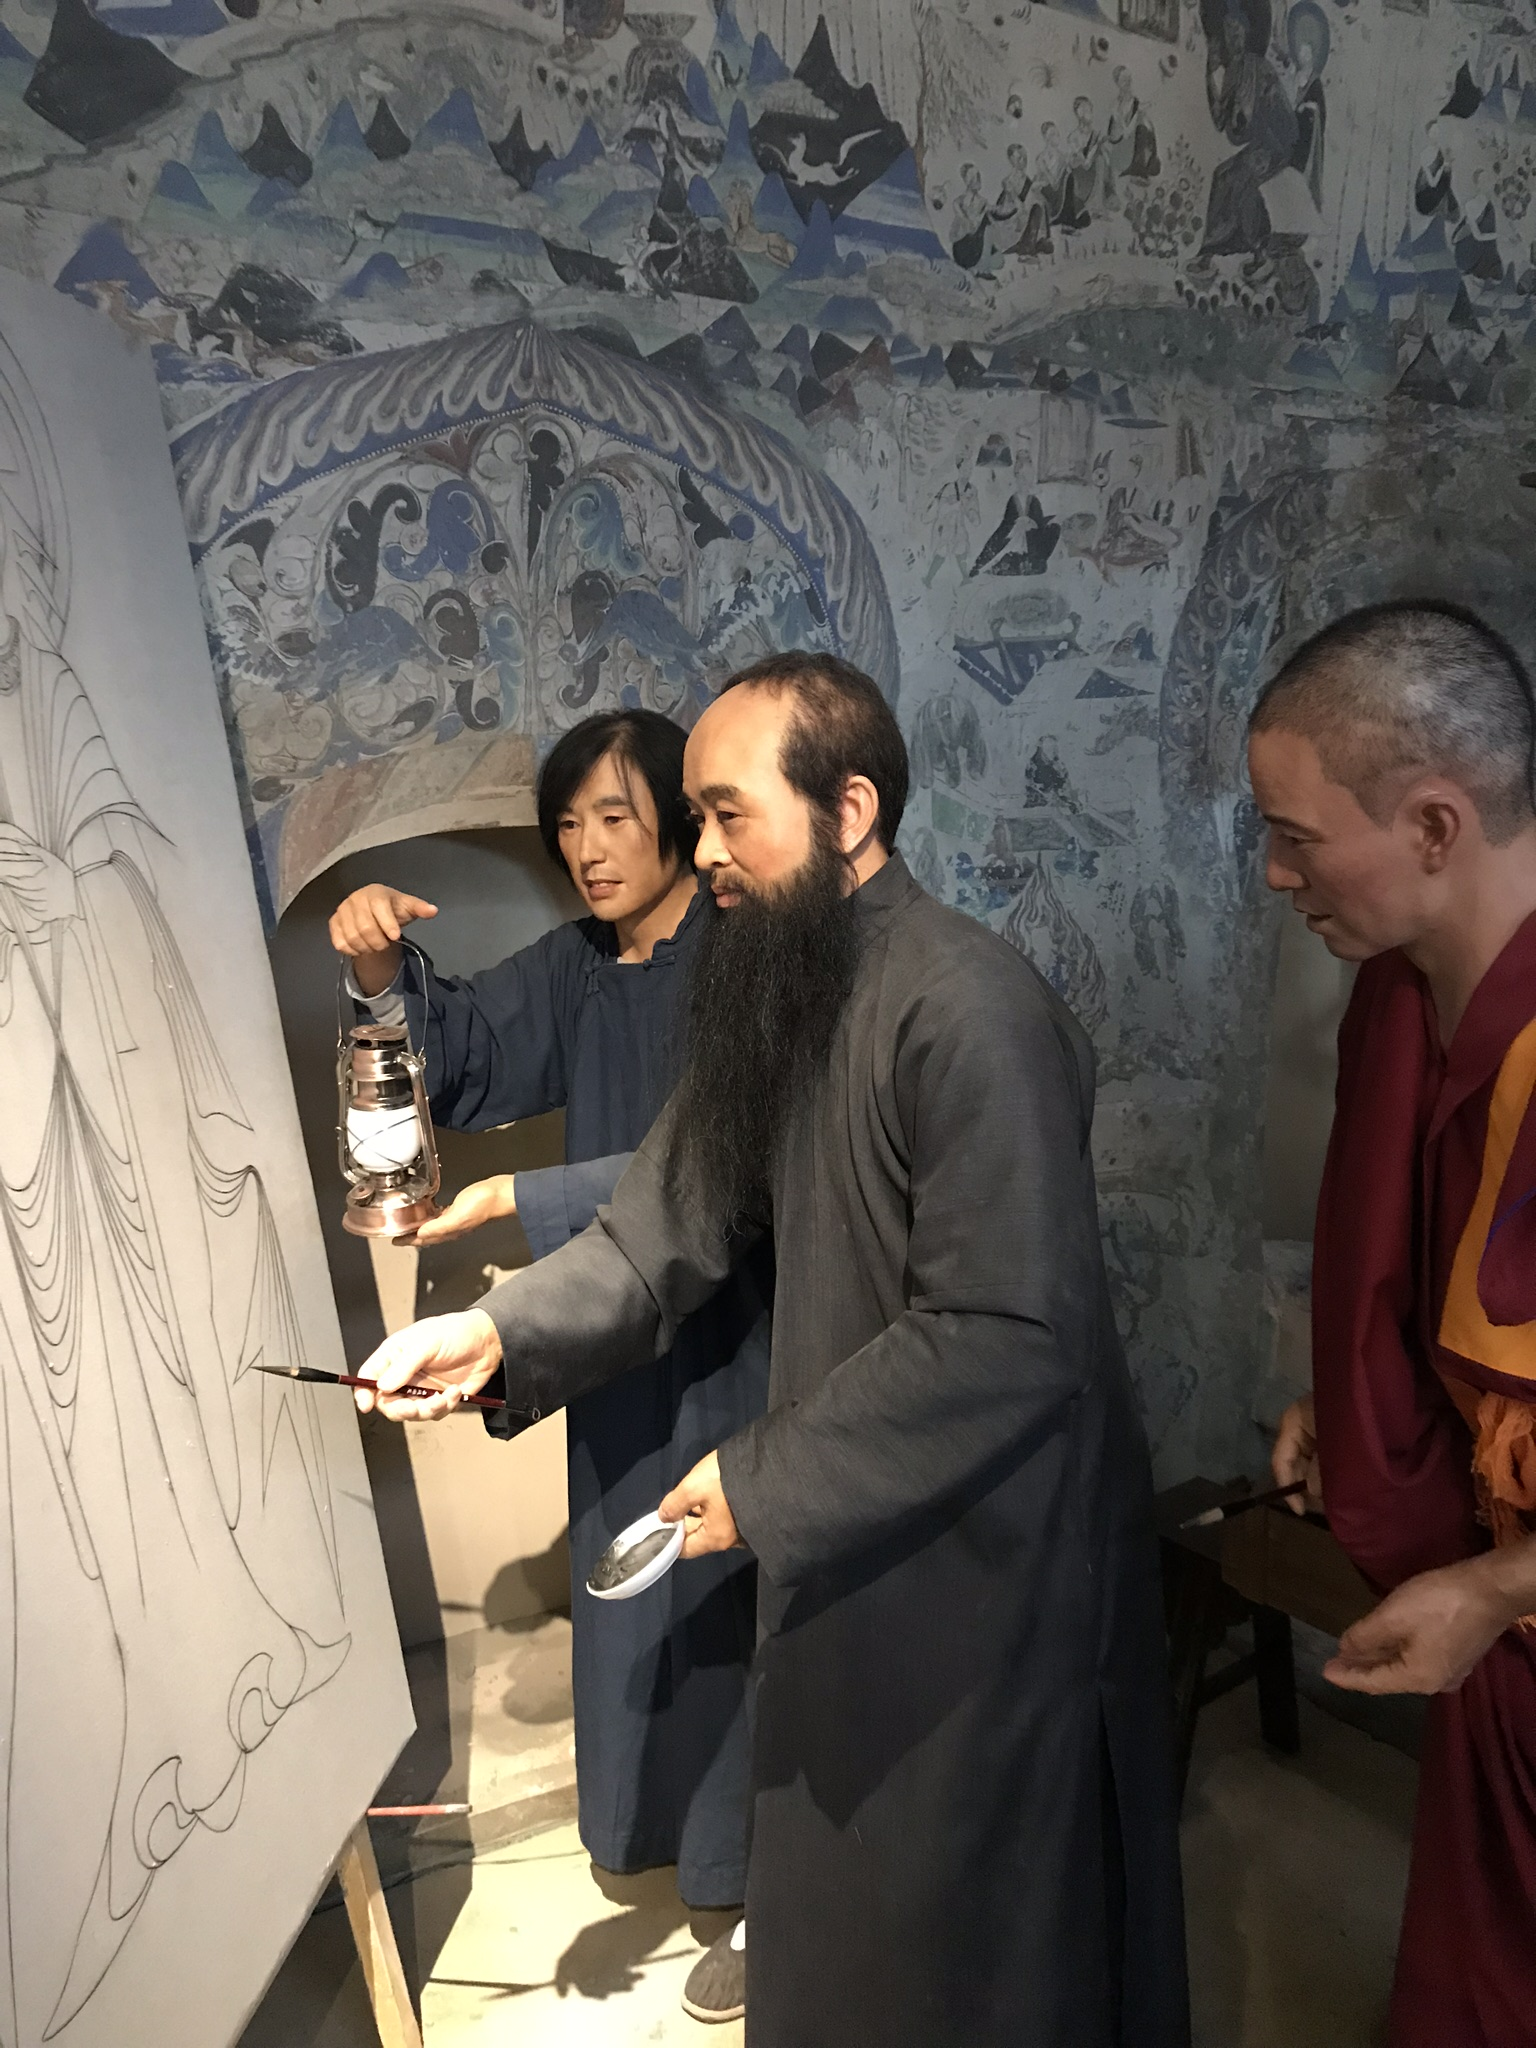 Gelungene Darstellungen im Zhang Daqian Museum